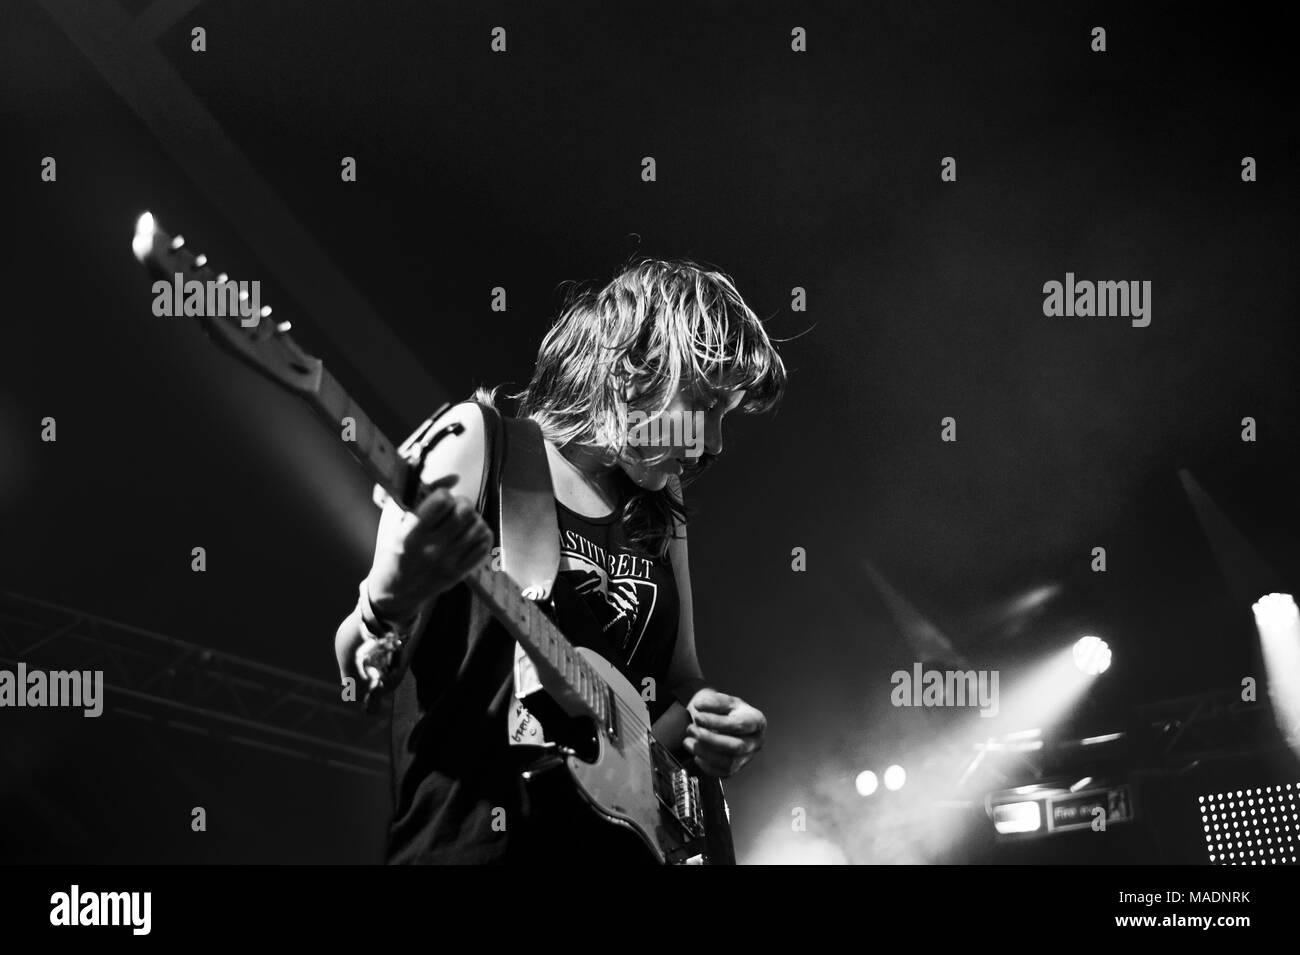 Courtney Barnett performing live at Glastonbury Festival, England, UK, 2015. - Stock Image